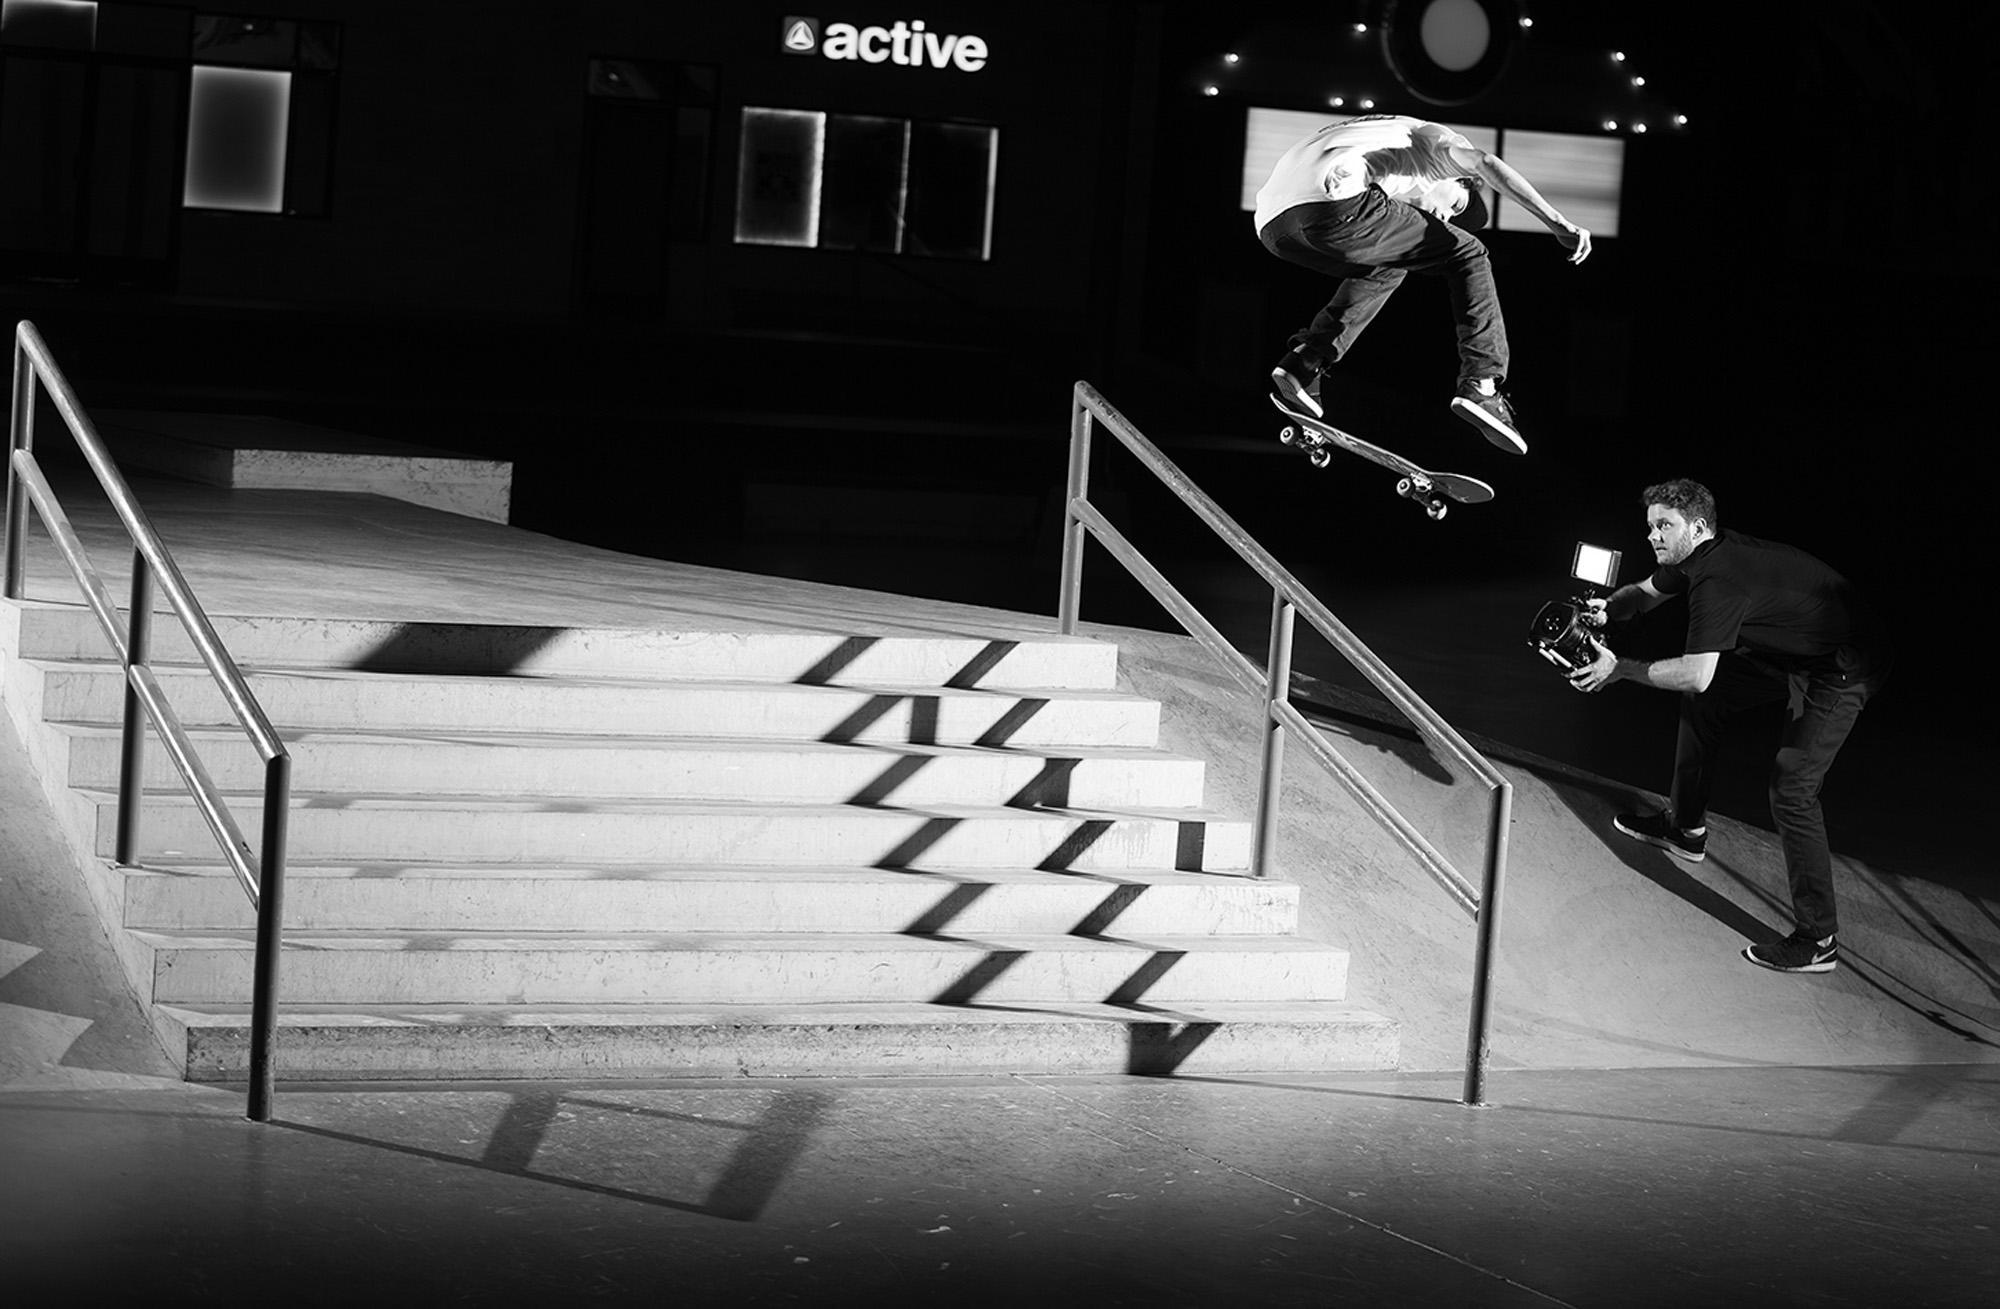 Tyson Bowerbank Almost Skateboards - The Berrics Recruit 2